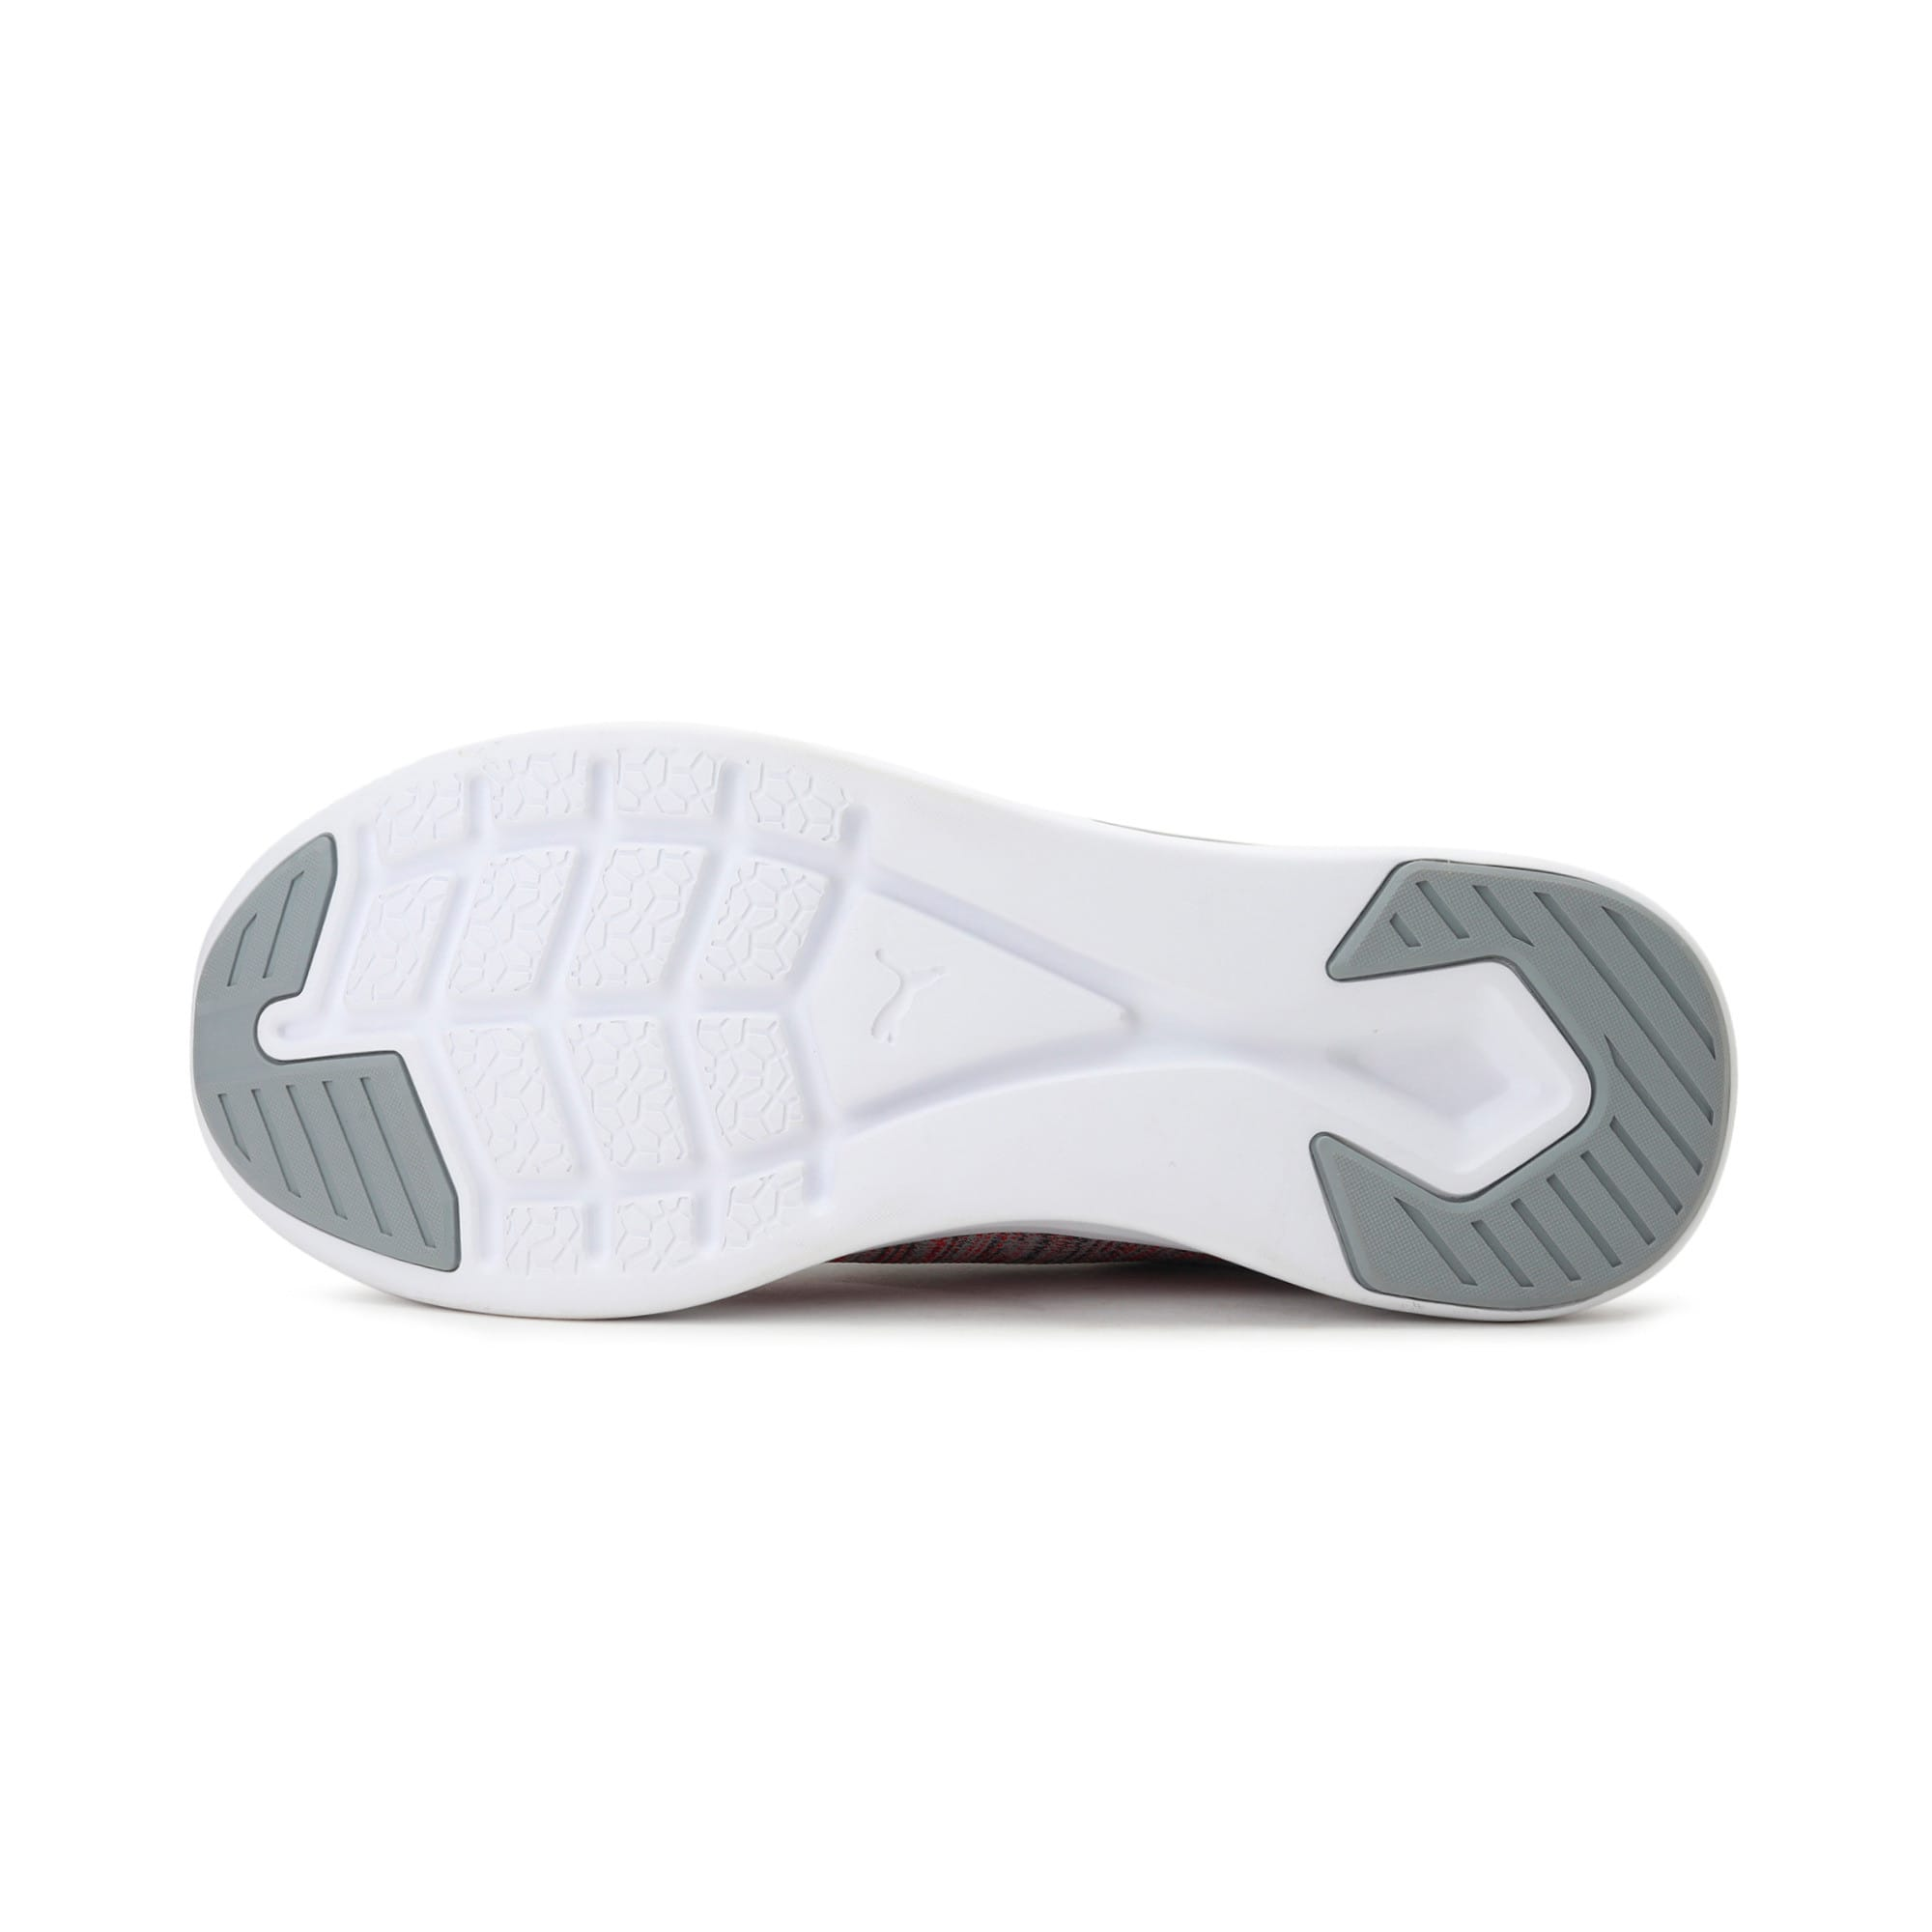 Thumbnail 3 of IGNITE Flash evoKNIT Men's Training Shoes, Quarry-High Risk Red-Asphalt, medium-IND